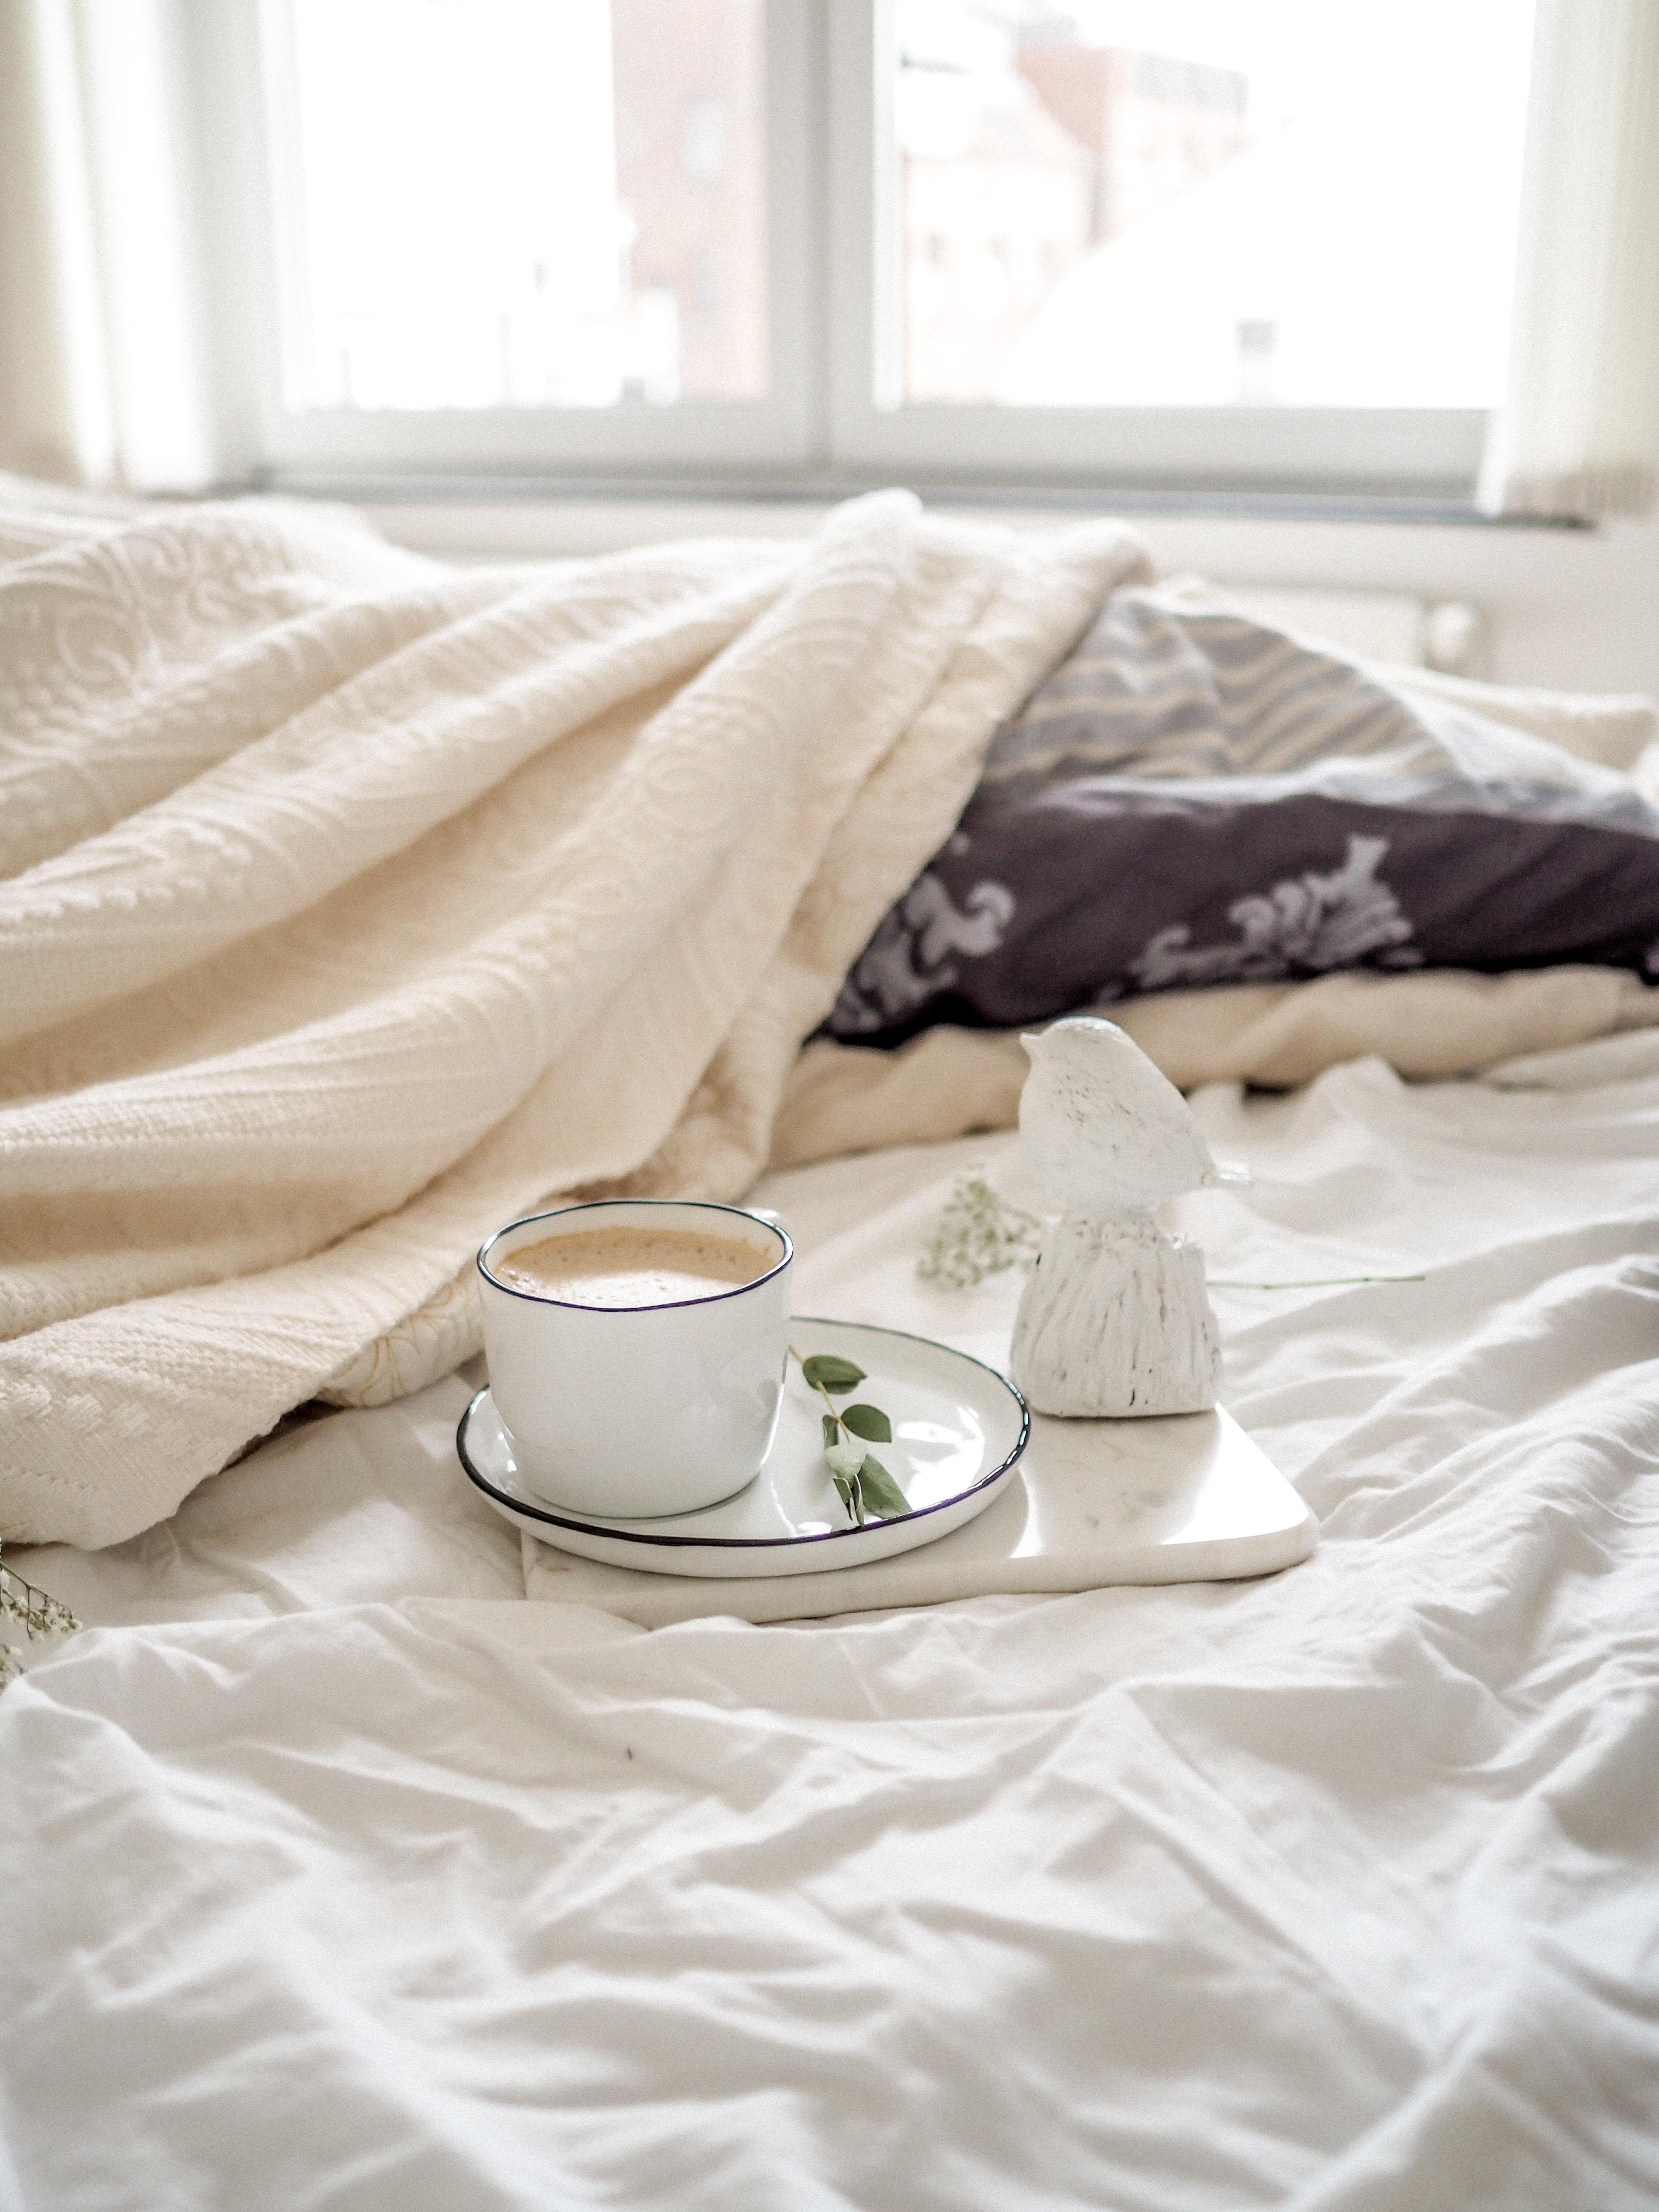 Je slaapkamer inrichten als hotel kamer - Maison Belle - Interieuradvies